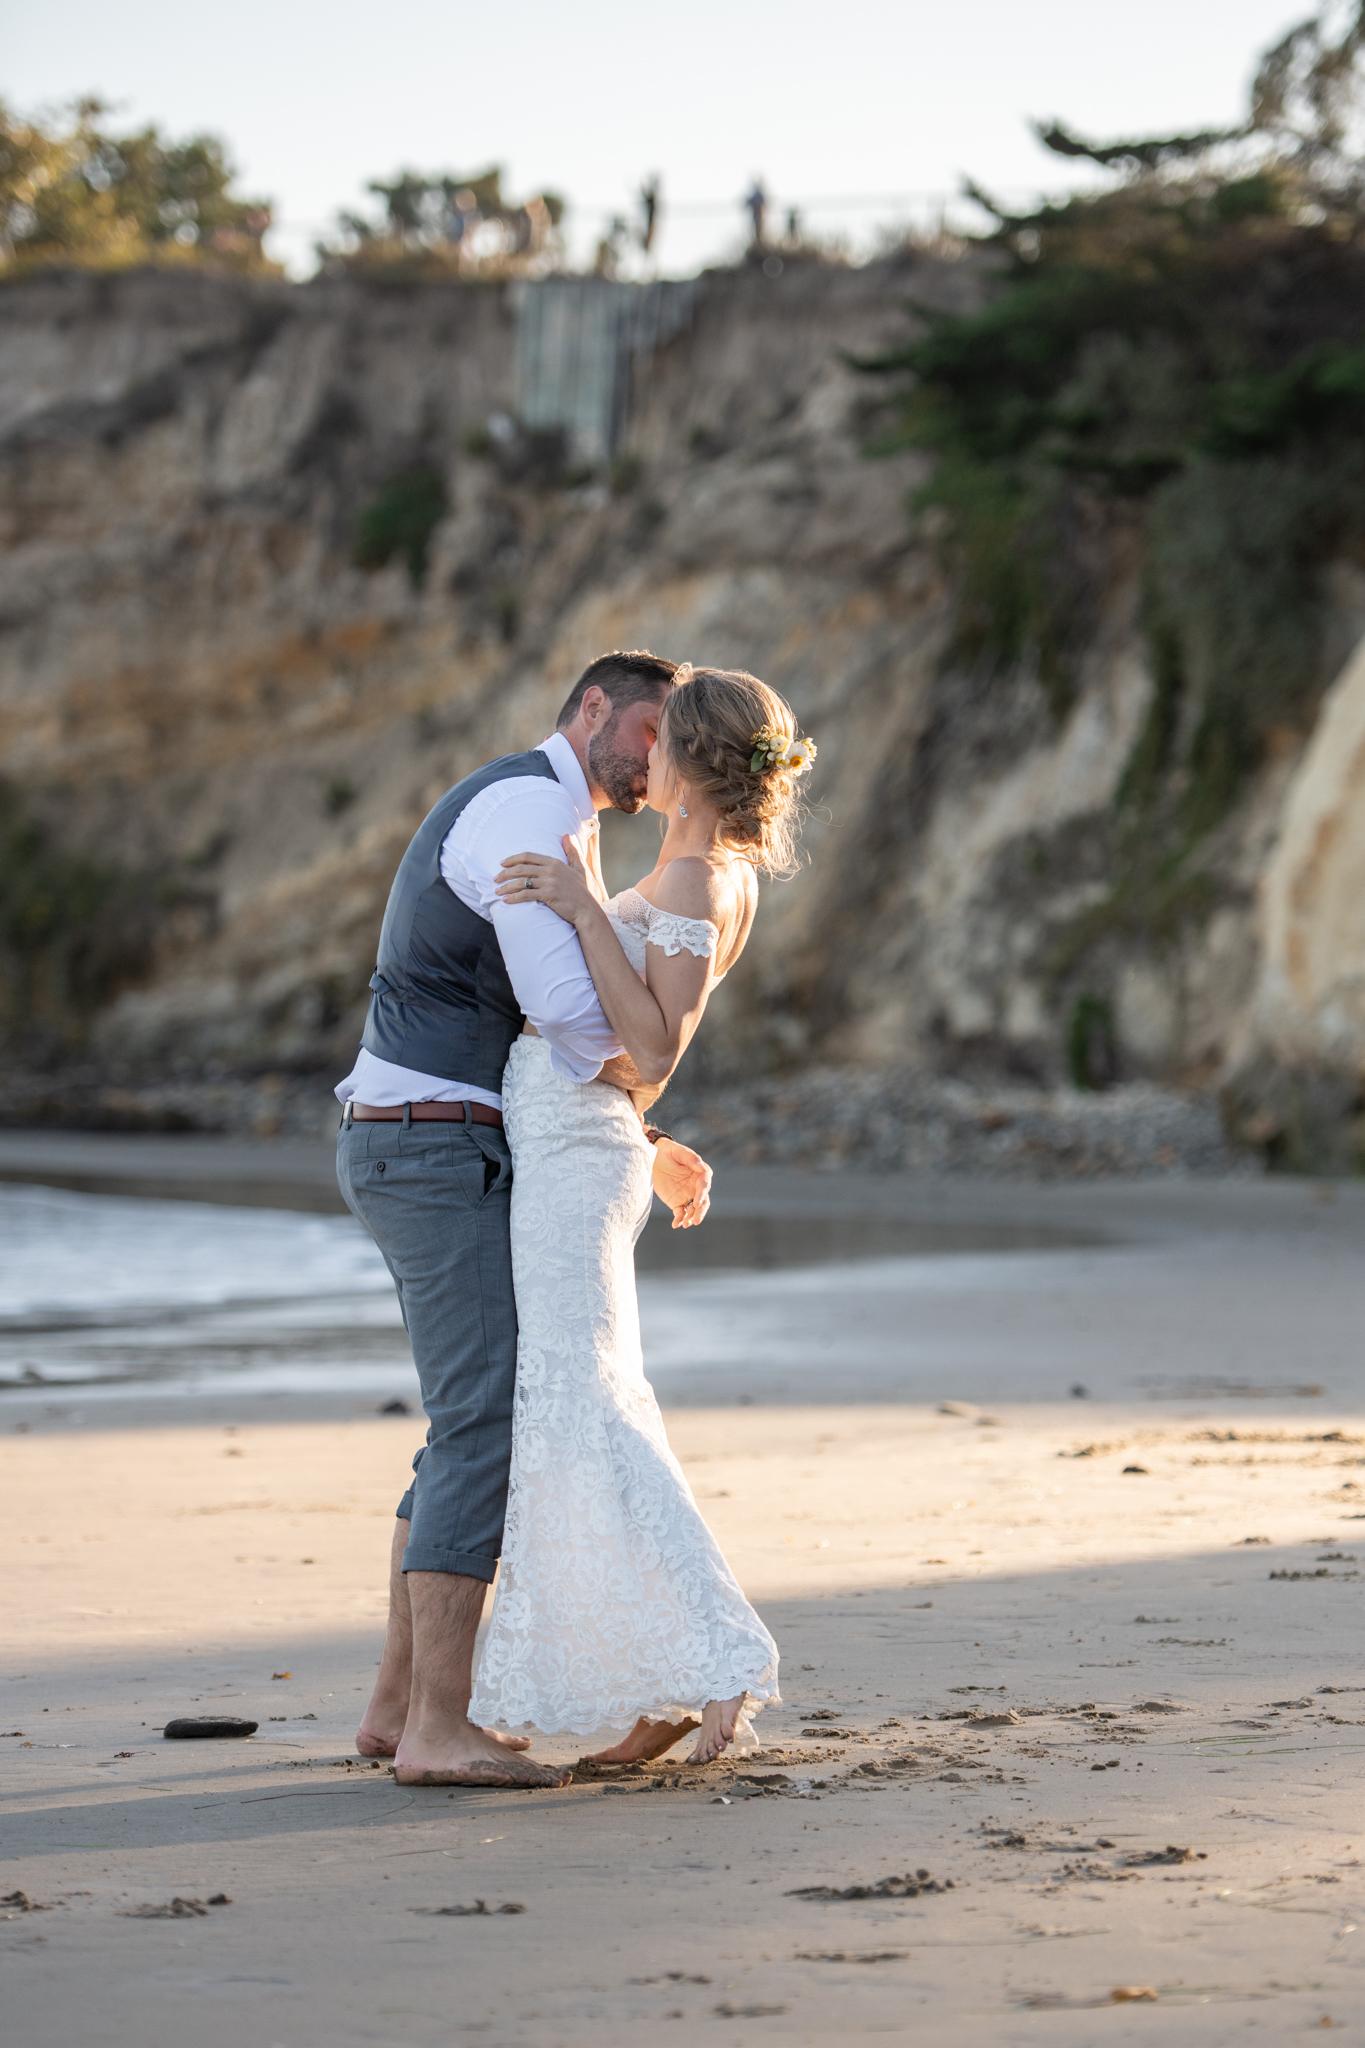 72_PRVW_Jenny_Ken_Wedding_Trevor_Hooper_Photo.jpg